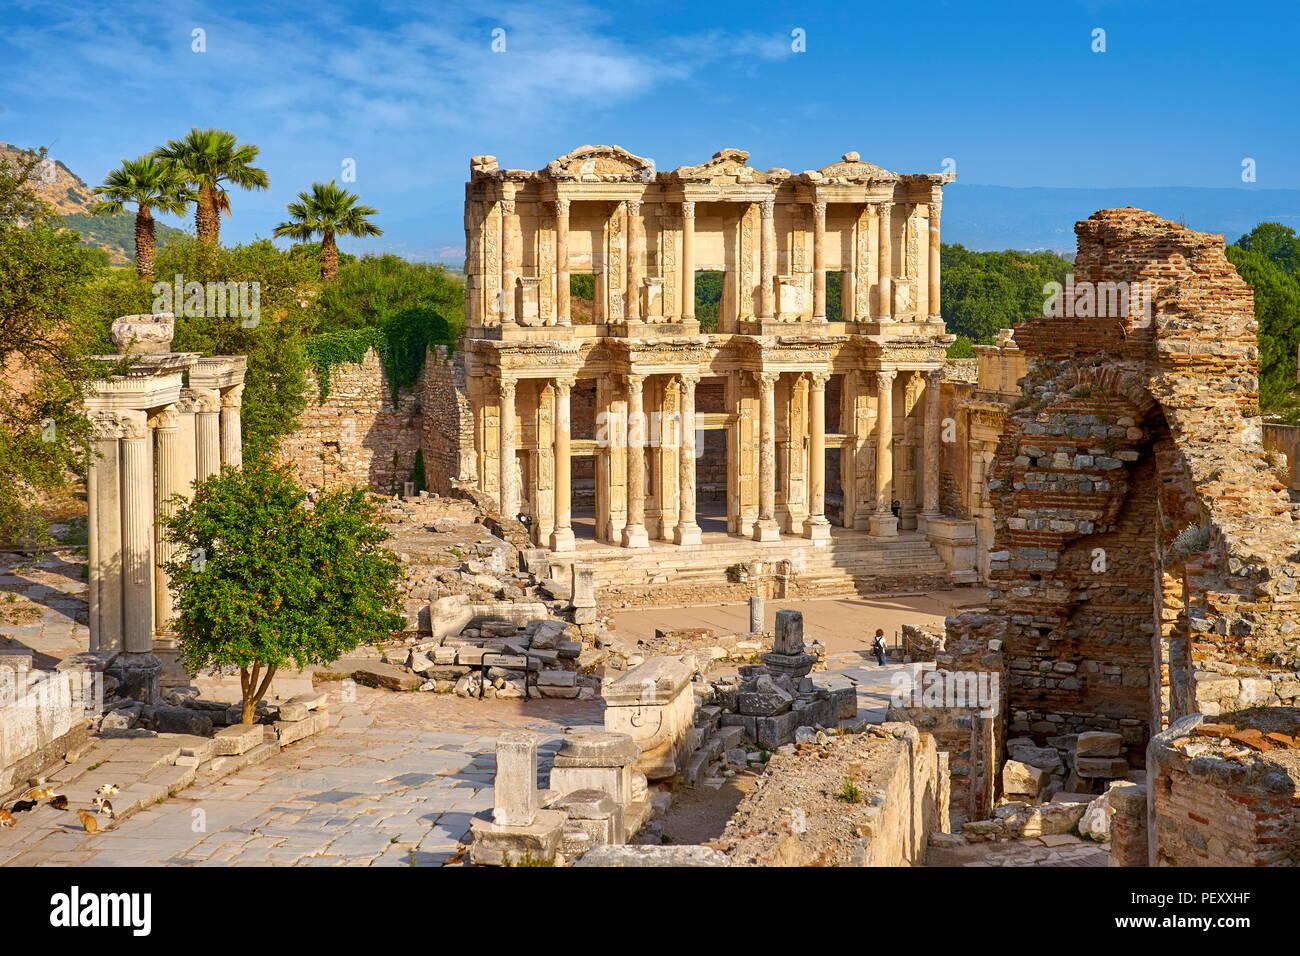 Bibliothek von Celsus, Ephesus antike Stadt, Izmir, Türkei Stockbild